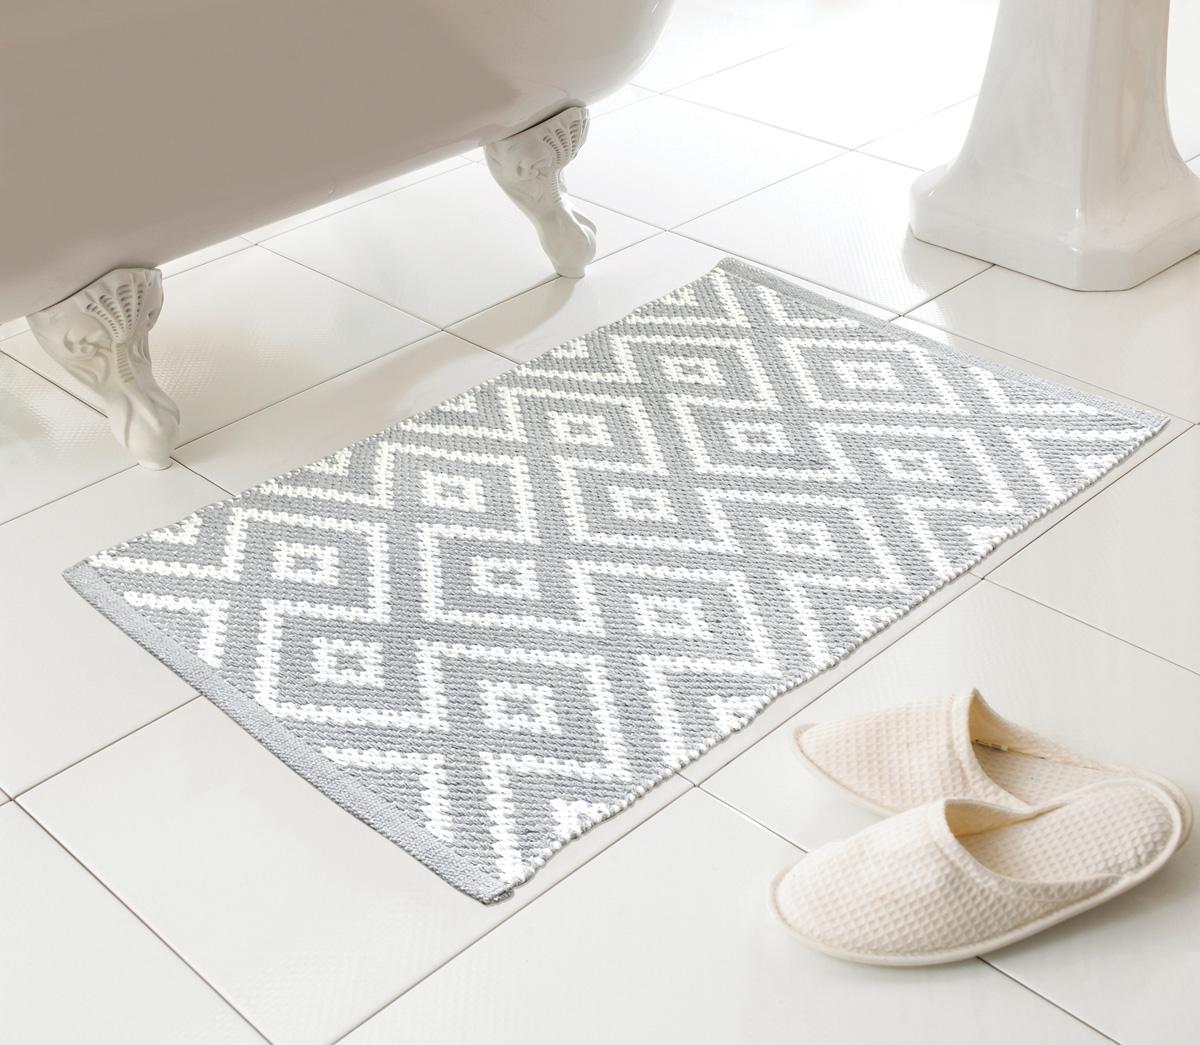 Country Club Kina Bath Mat Grey Bathroom Soft Woven Patterned Decorative Ebay